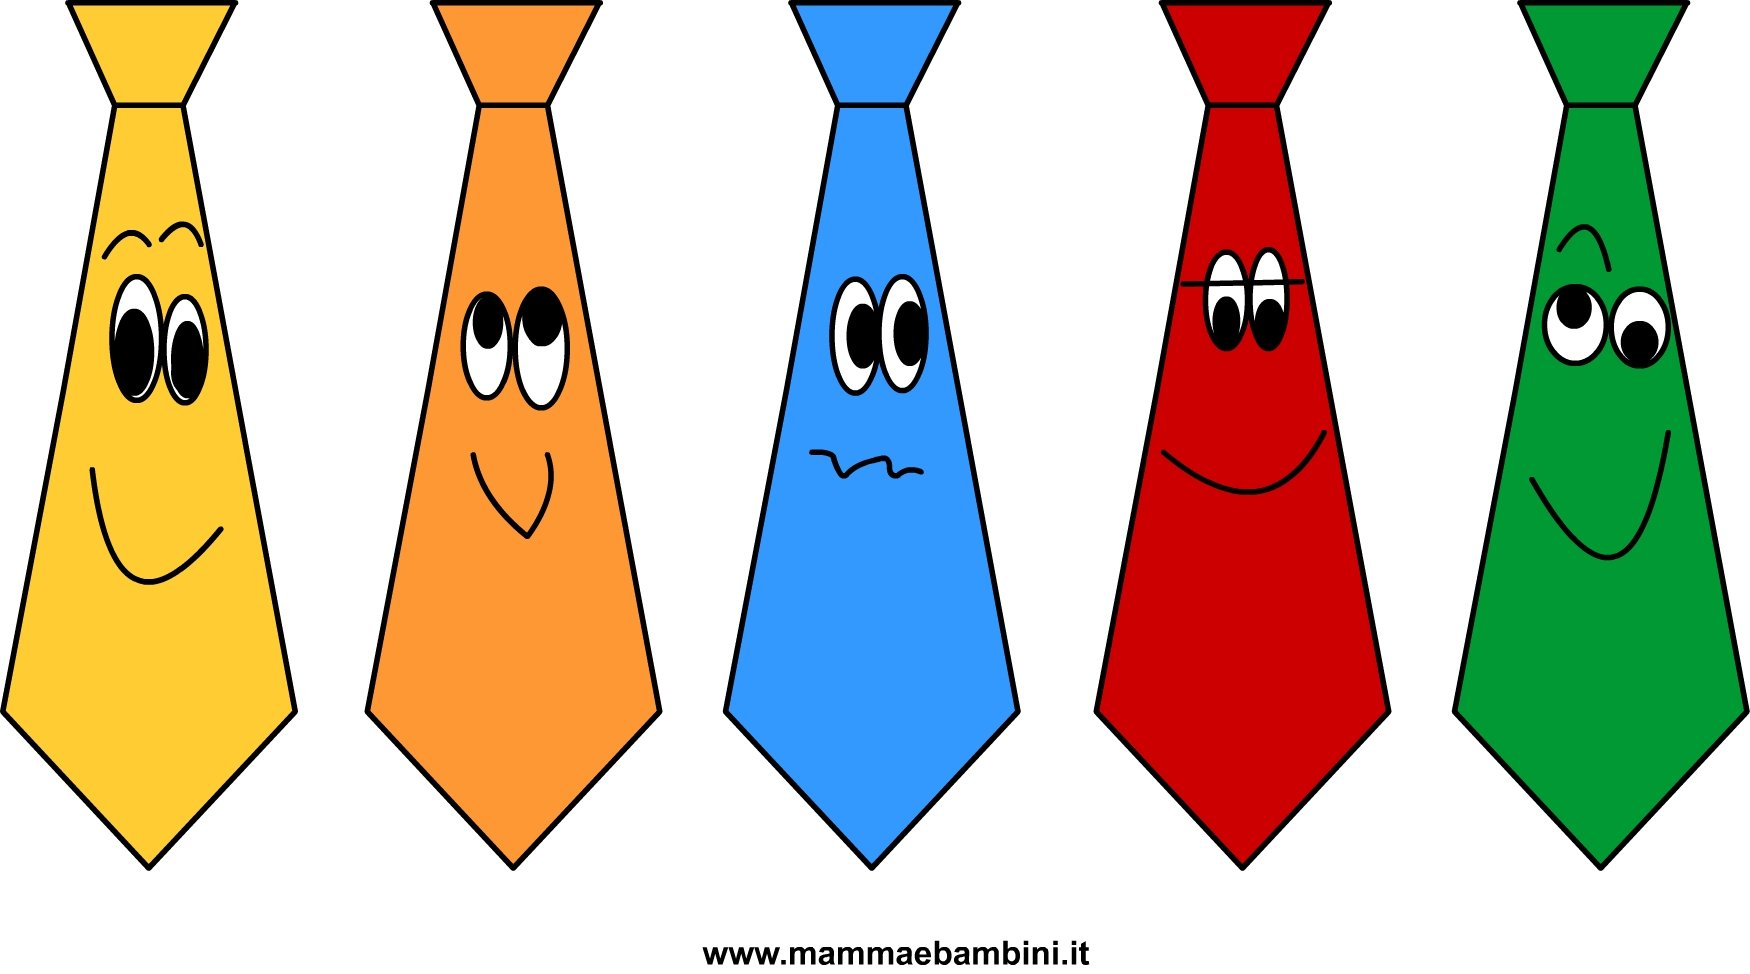 Segnalibri a cravatta per la Festa del Papà